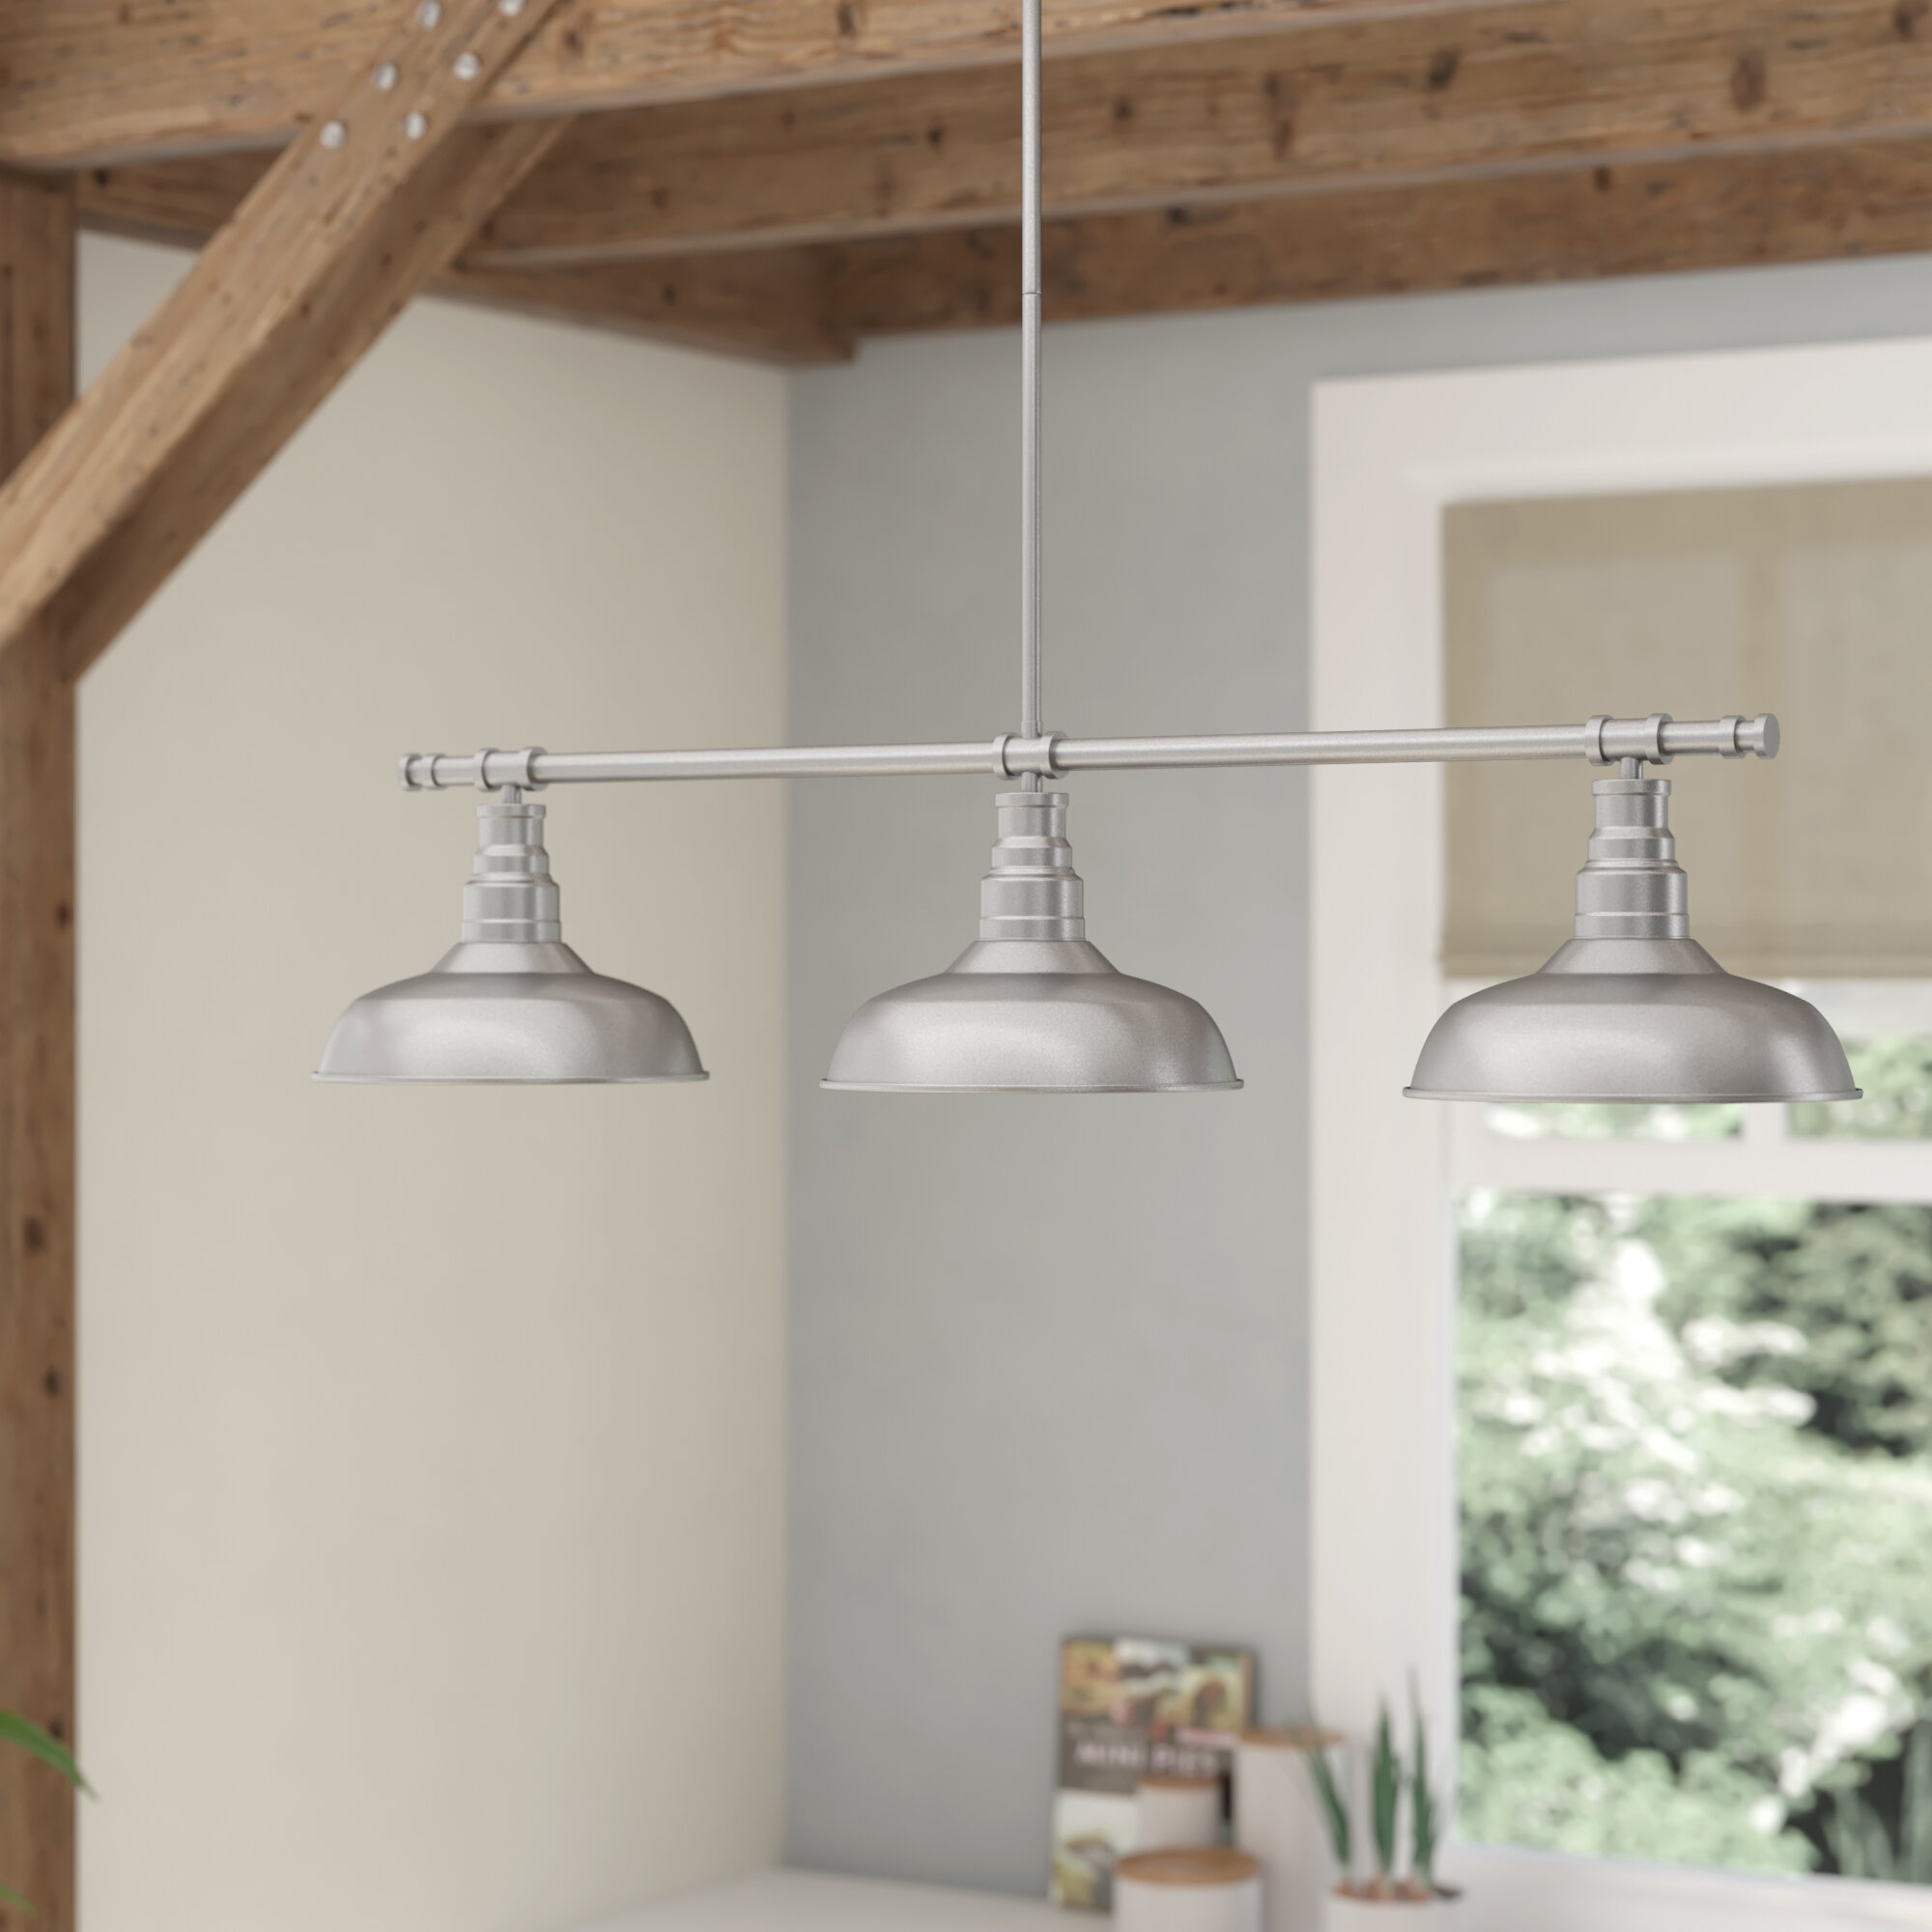 Laurel foundry modern farmhouse stephine 3 light kitchen island pendant reviews wayfair